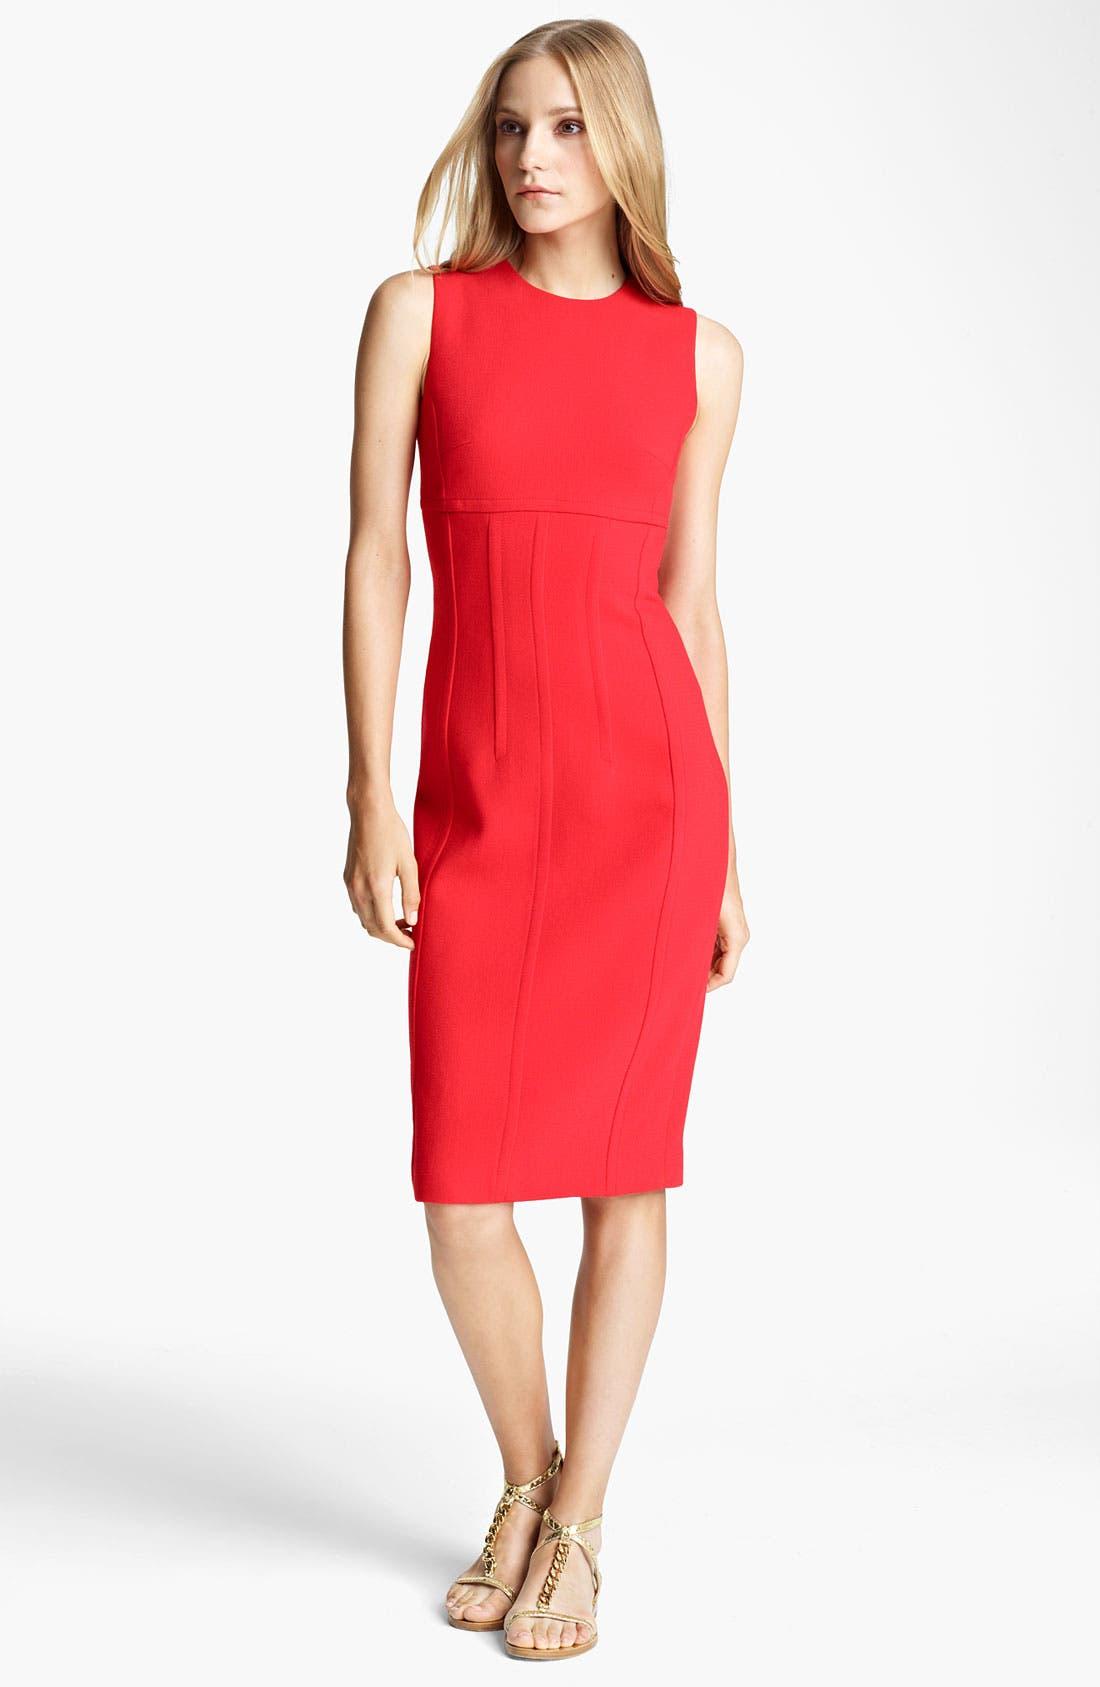 Main Image - Michael Kors Seamed Bouclé Sheath Dress